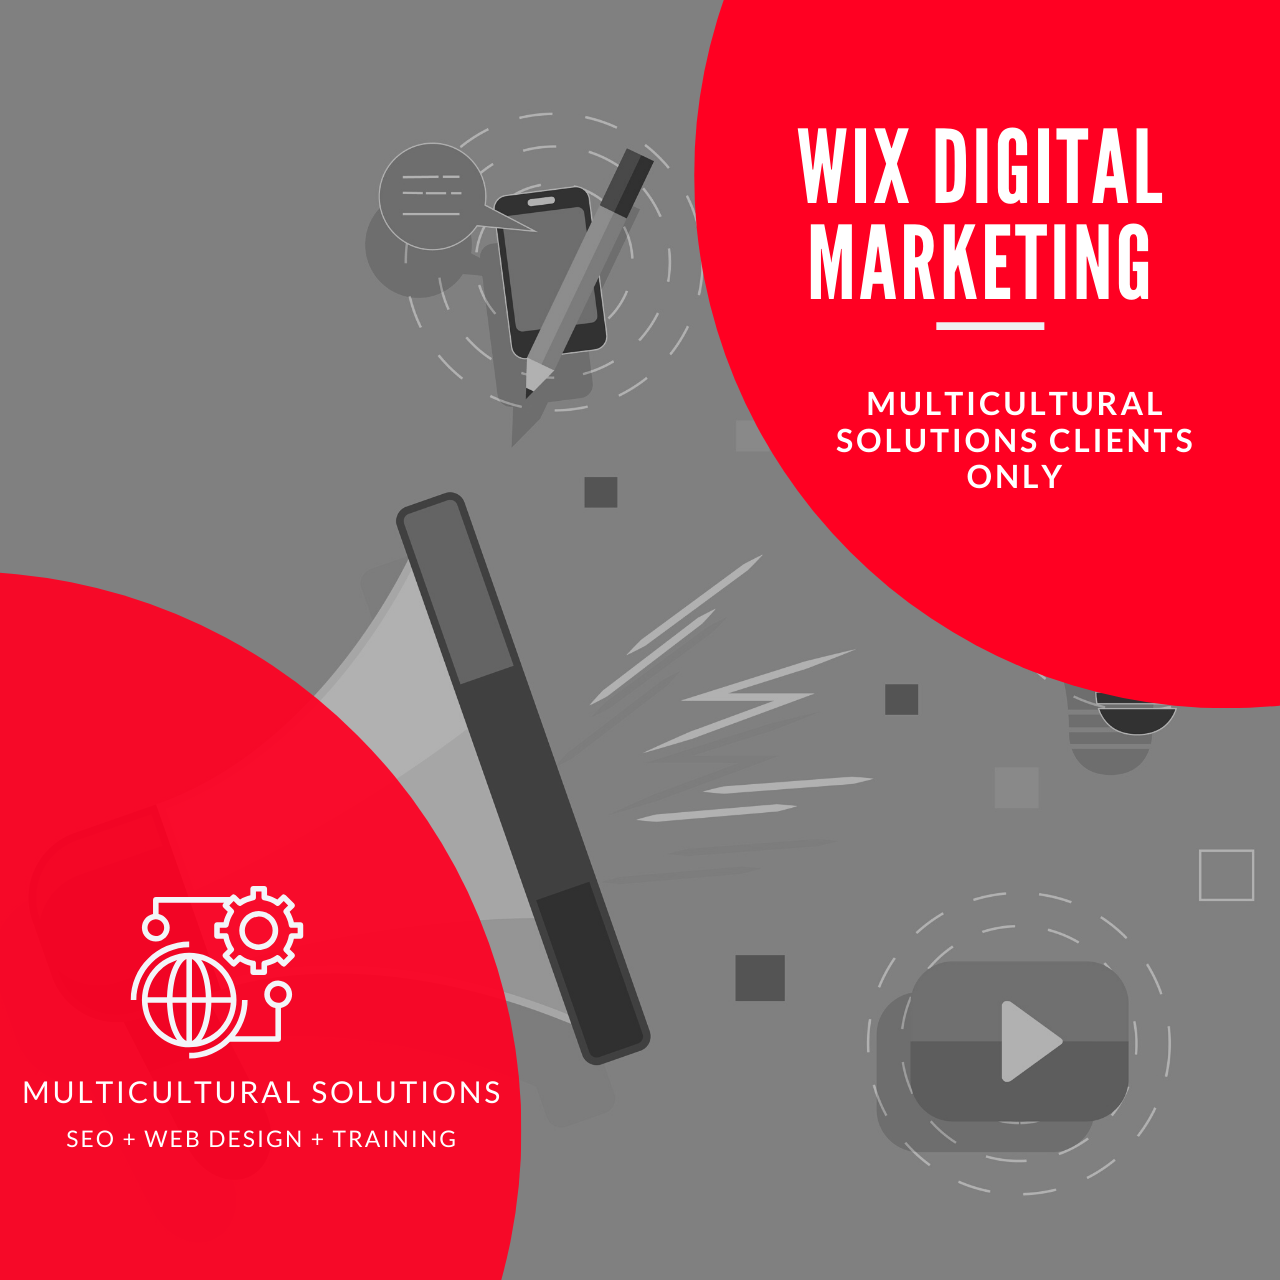 Wix Digital Marketing (FREE)